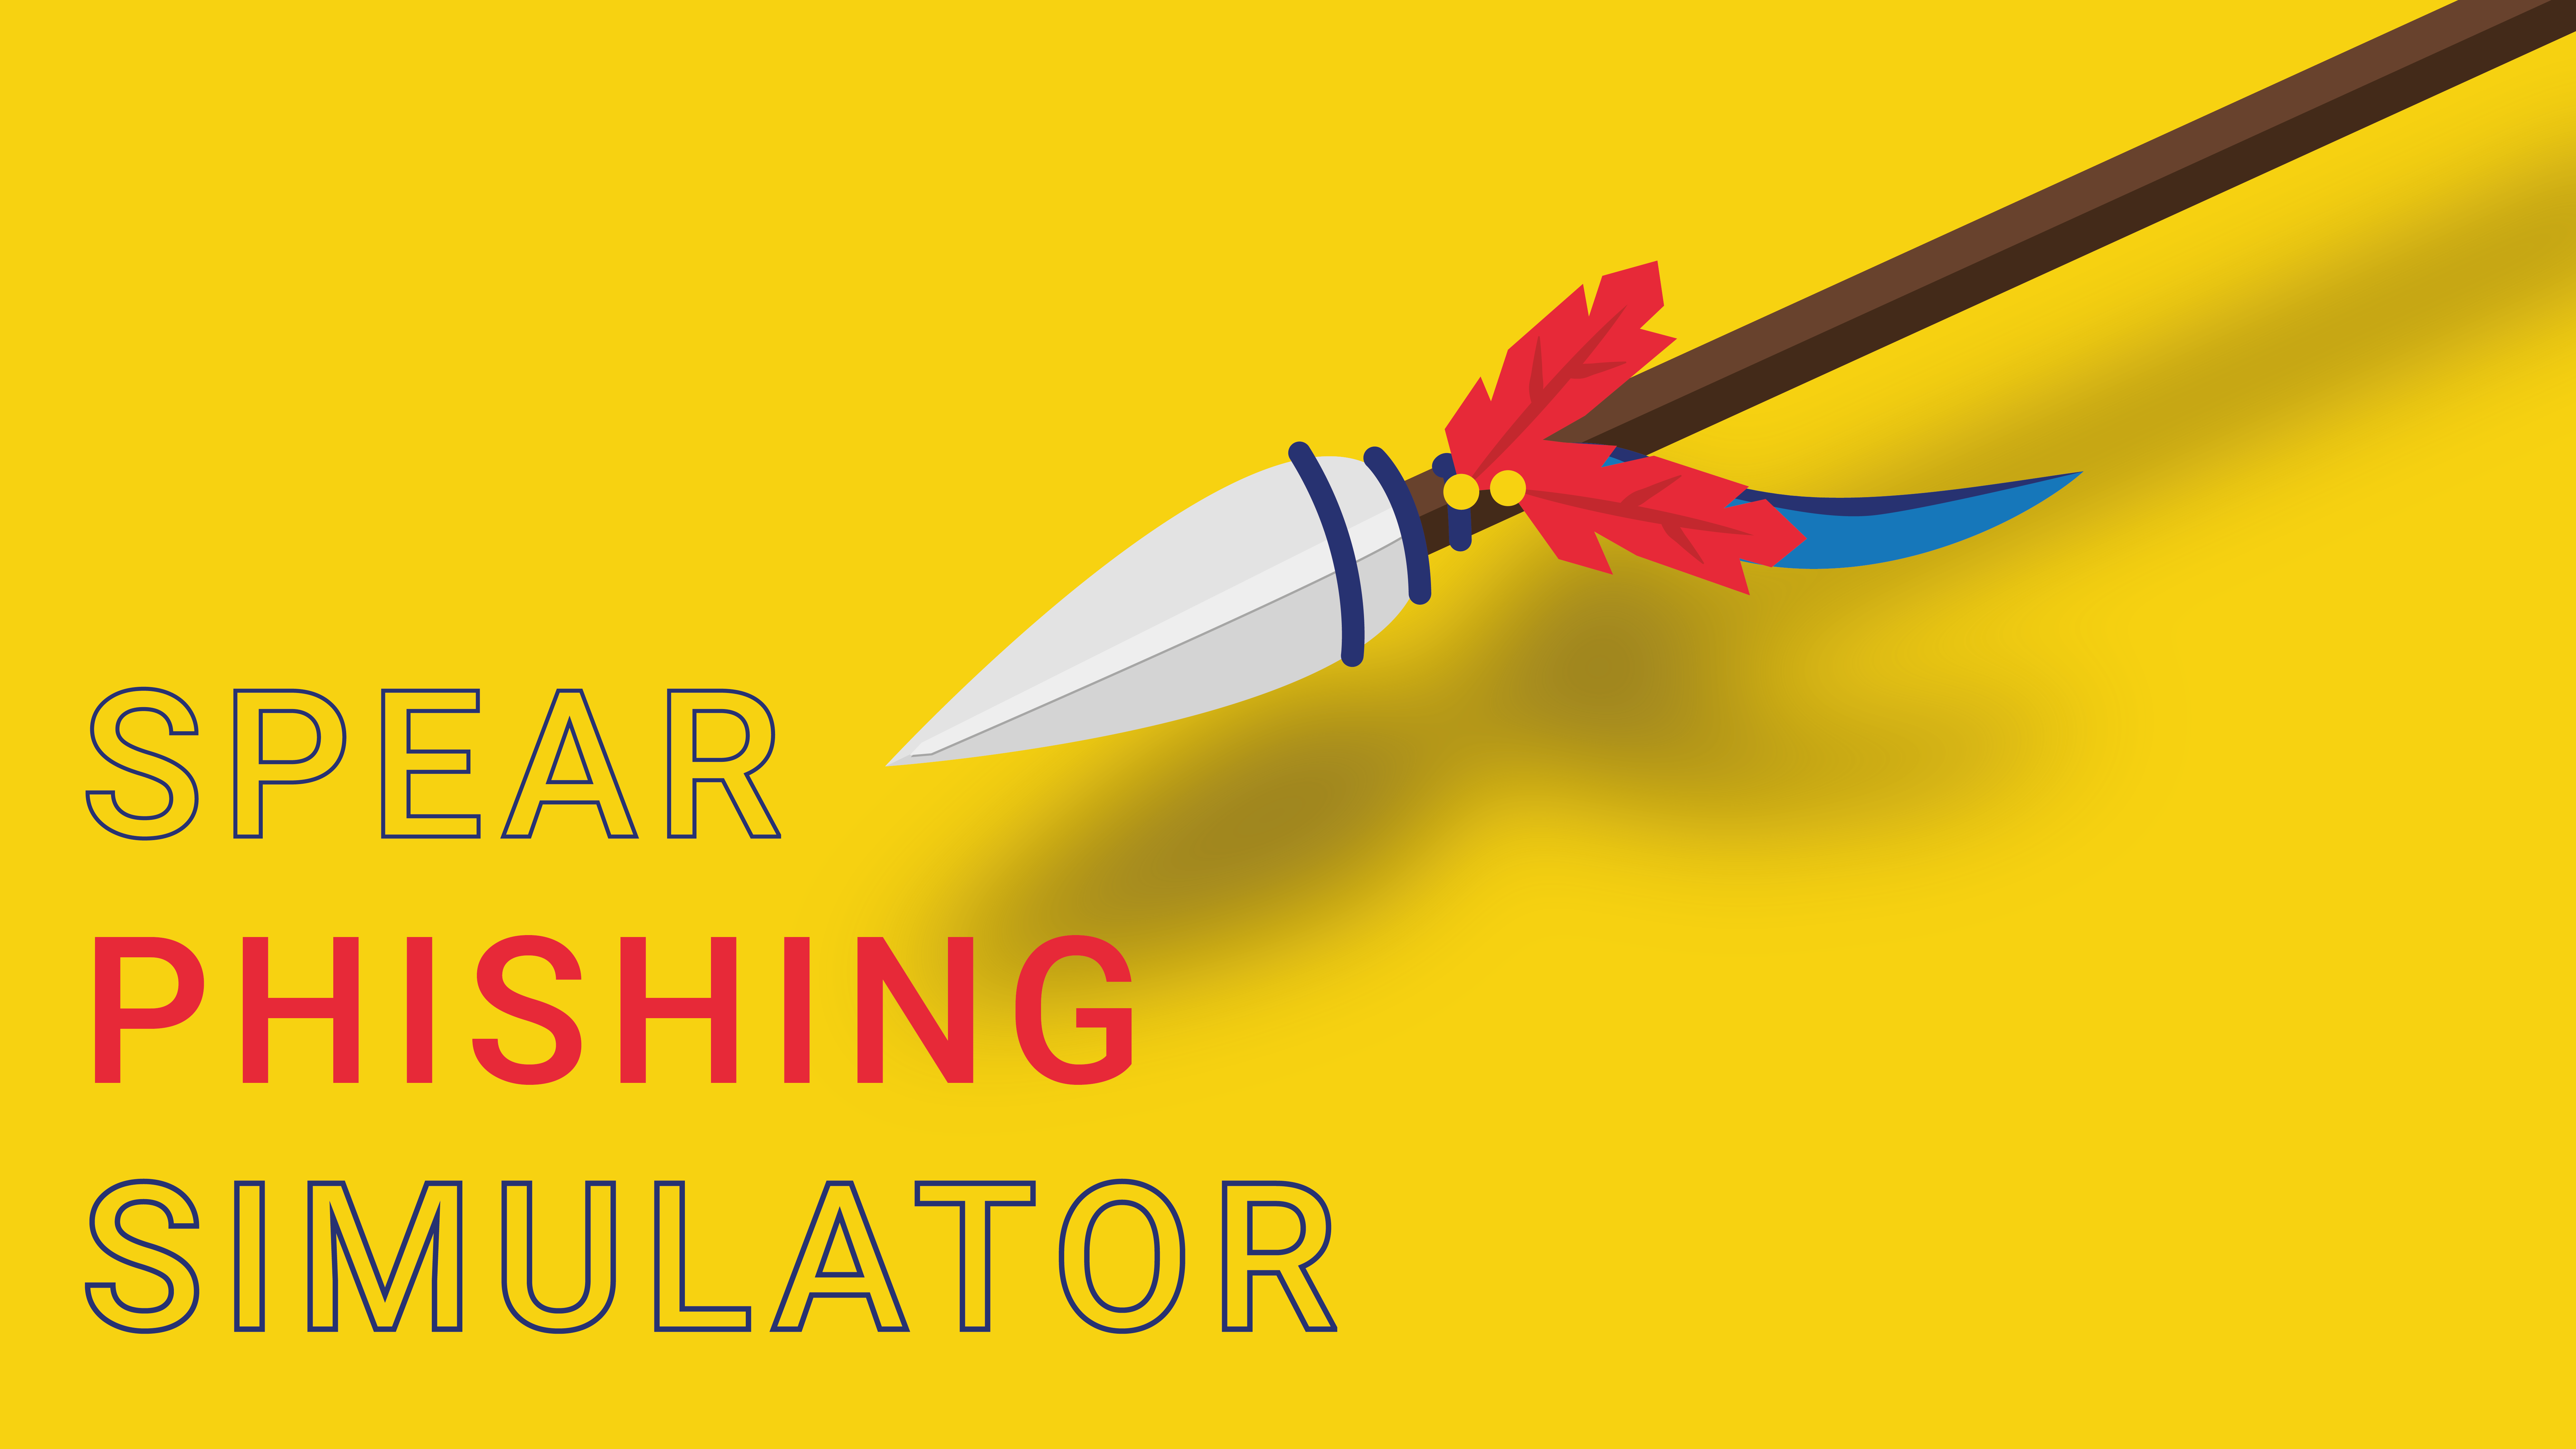 Spear Phishing Attack Simulator